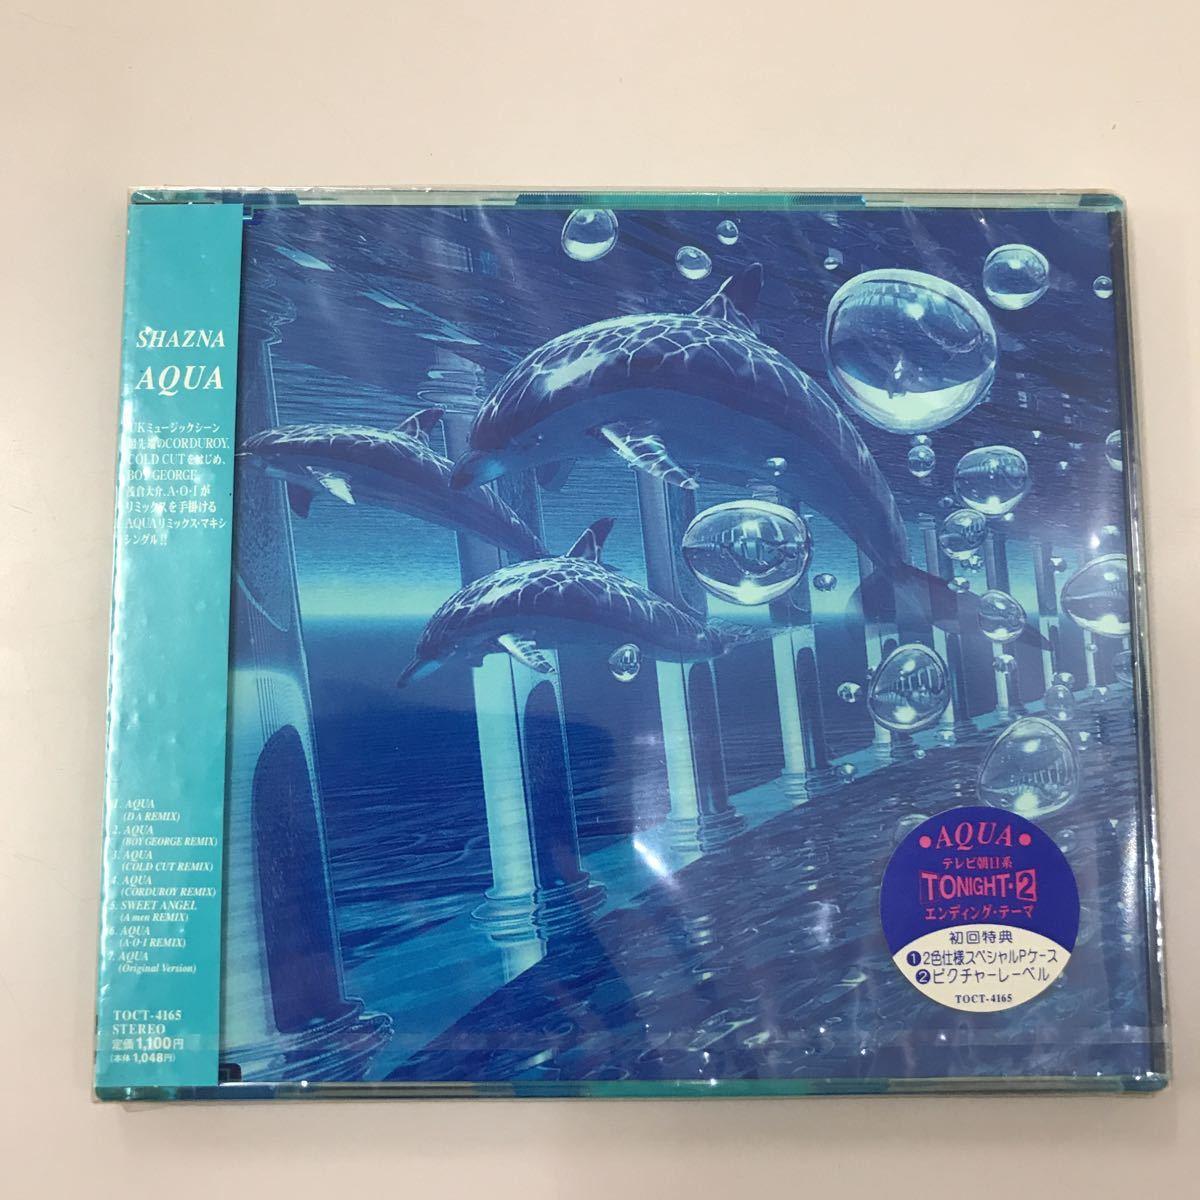 CD 未開封【邦楽】長期保存品 SHAZNA AQUA